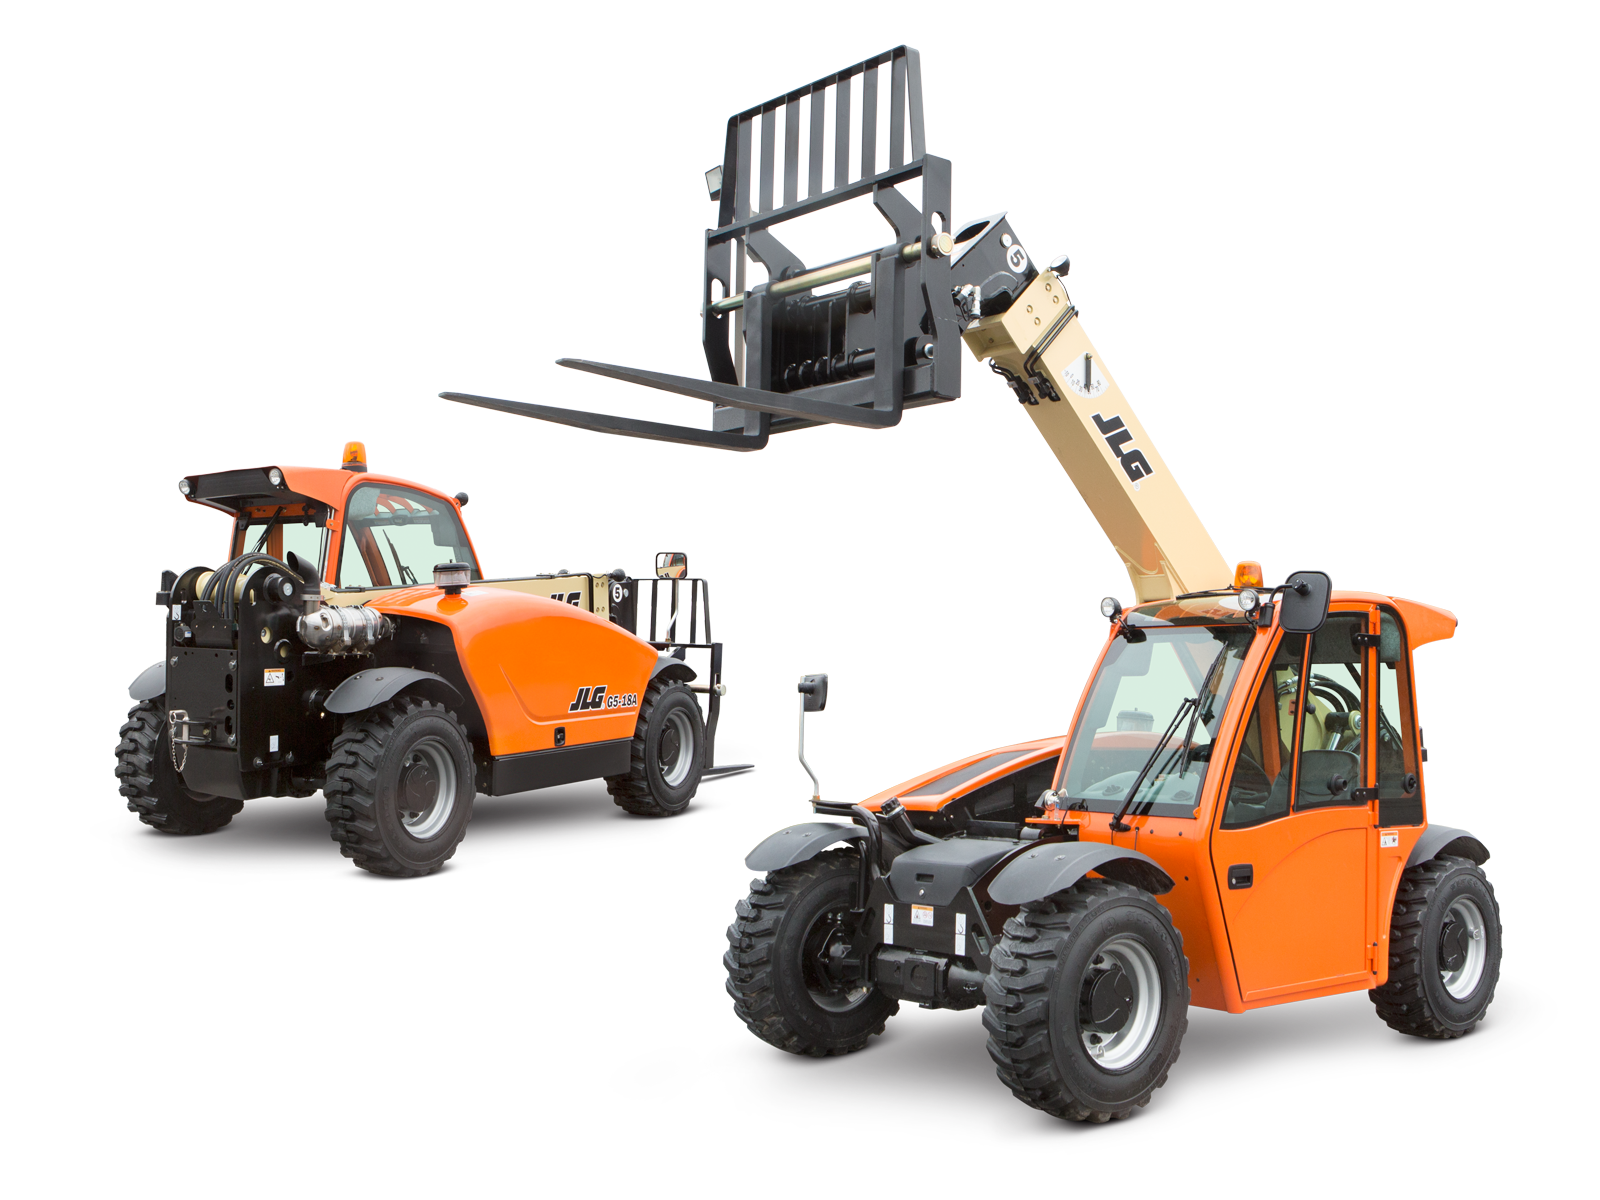 JLG® G5-18A Telehandler   Compact For Tight Job Sites   JLG